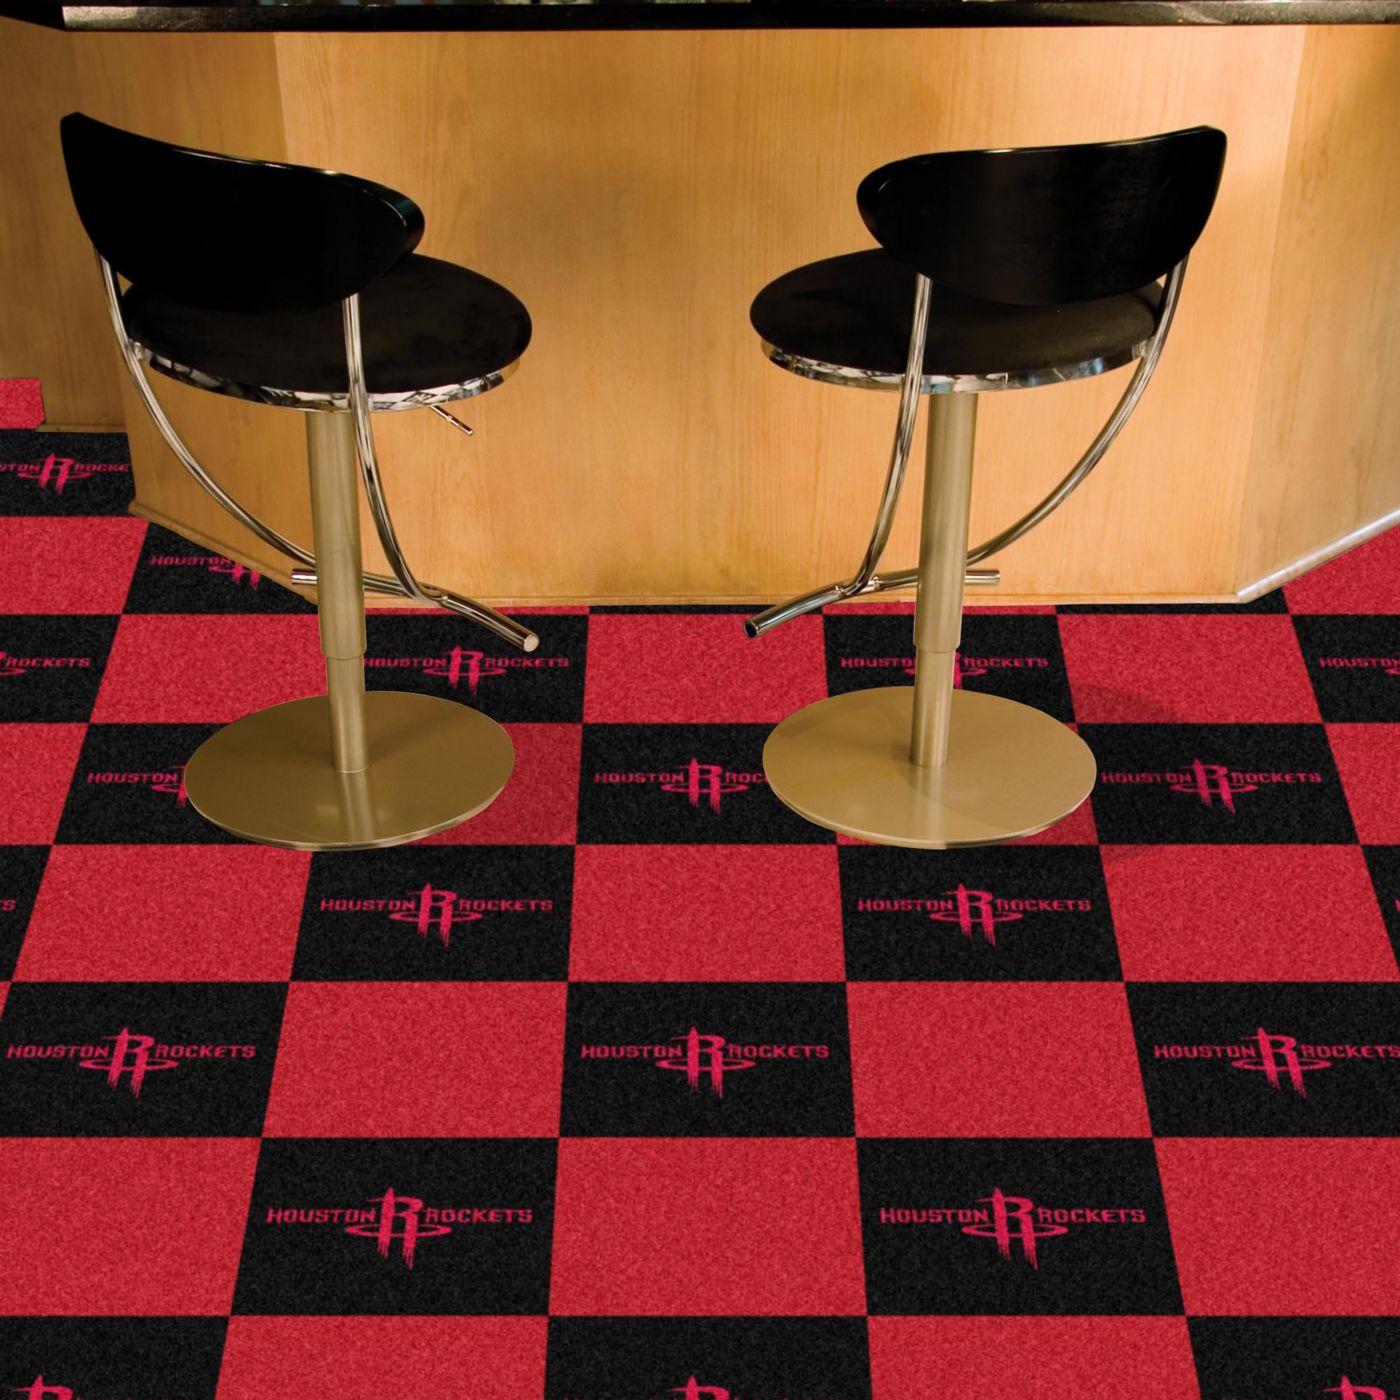 Houston Rockets Carpet Tiles